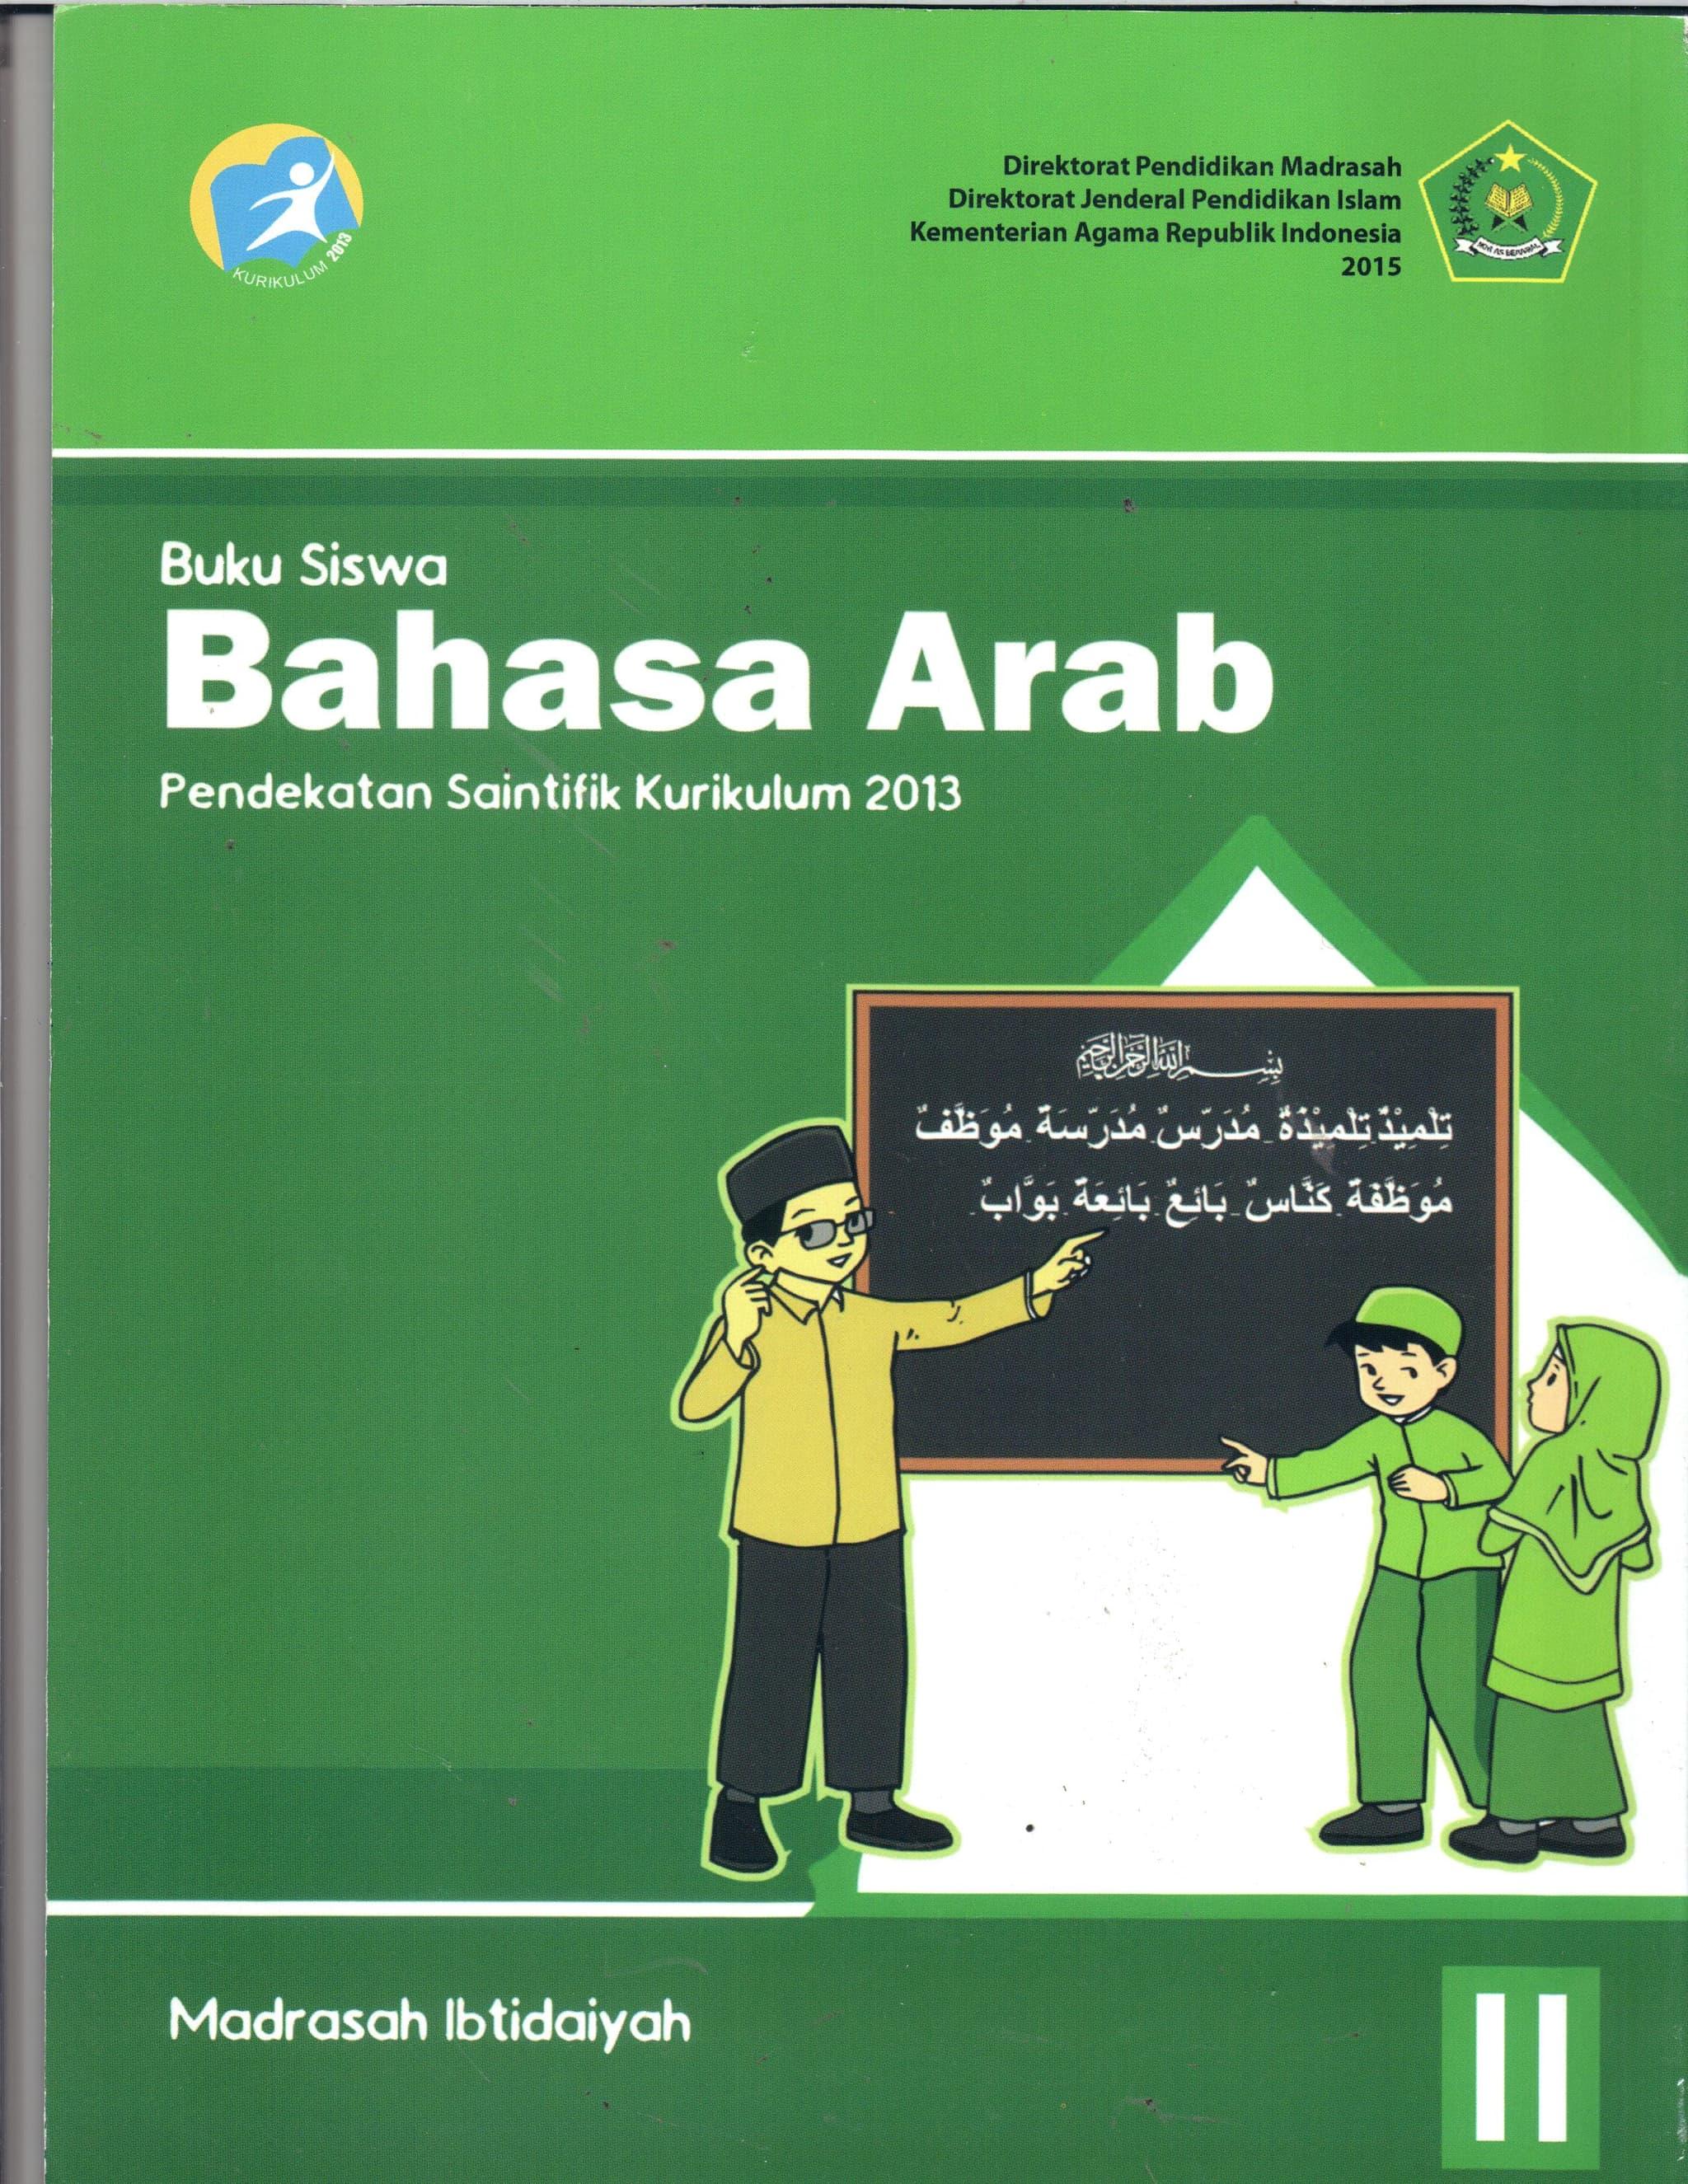 Hasil gambar untuk buku b. arab mi